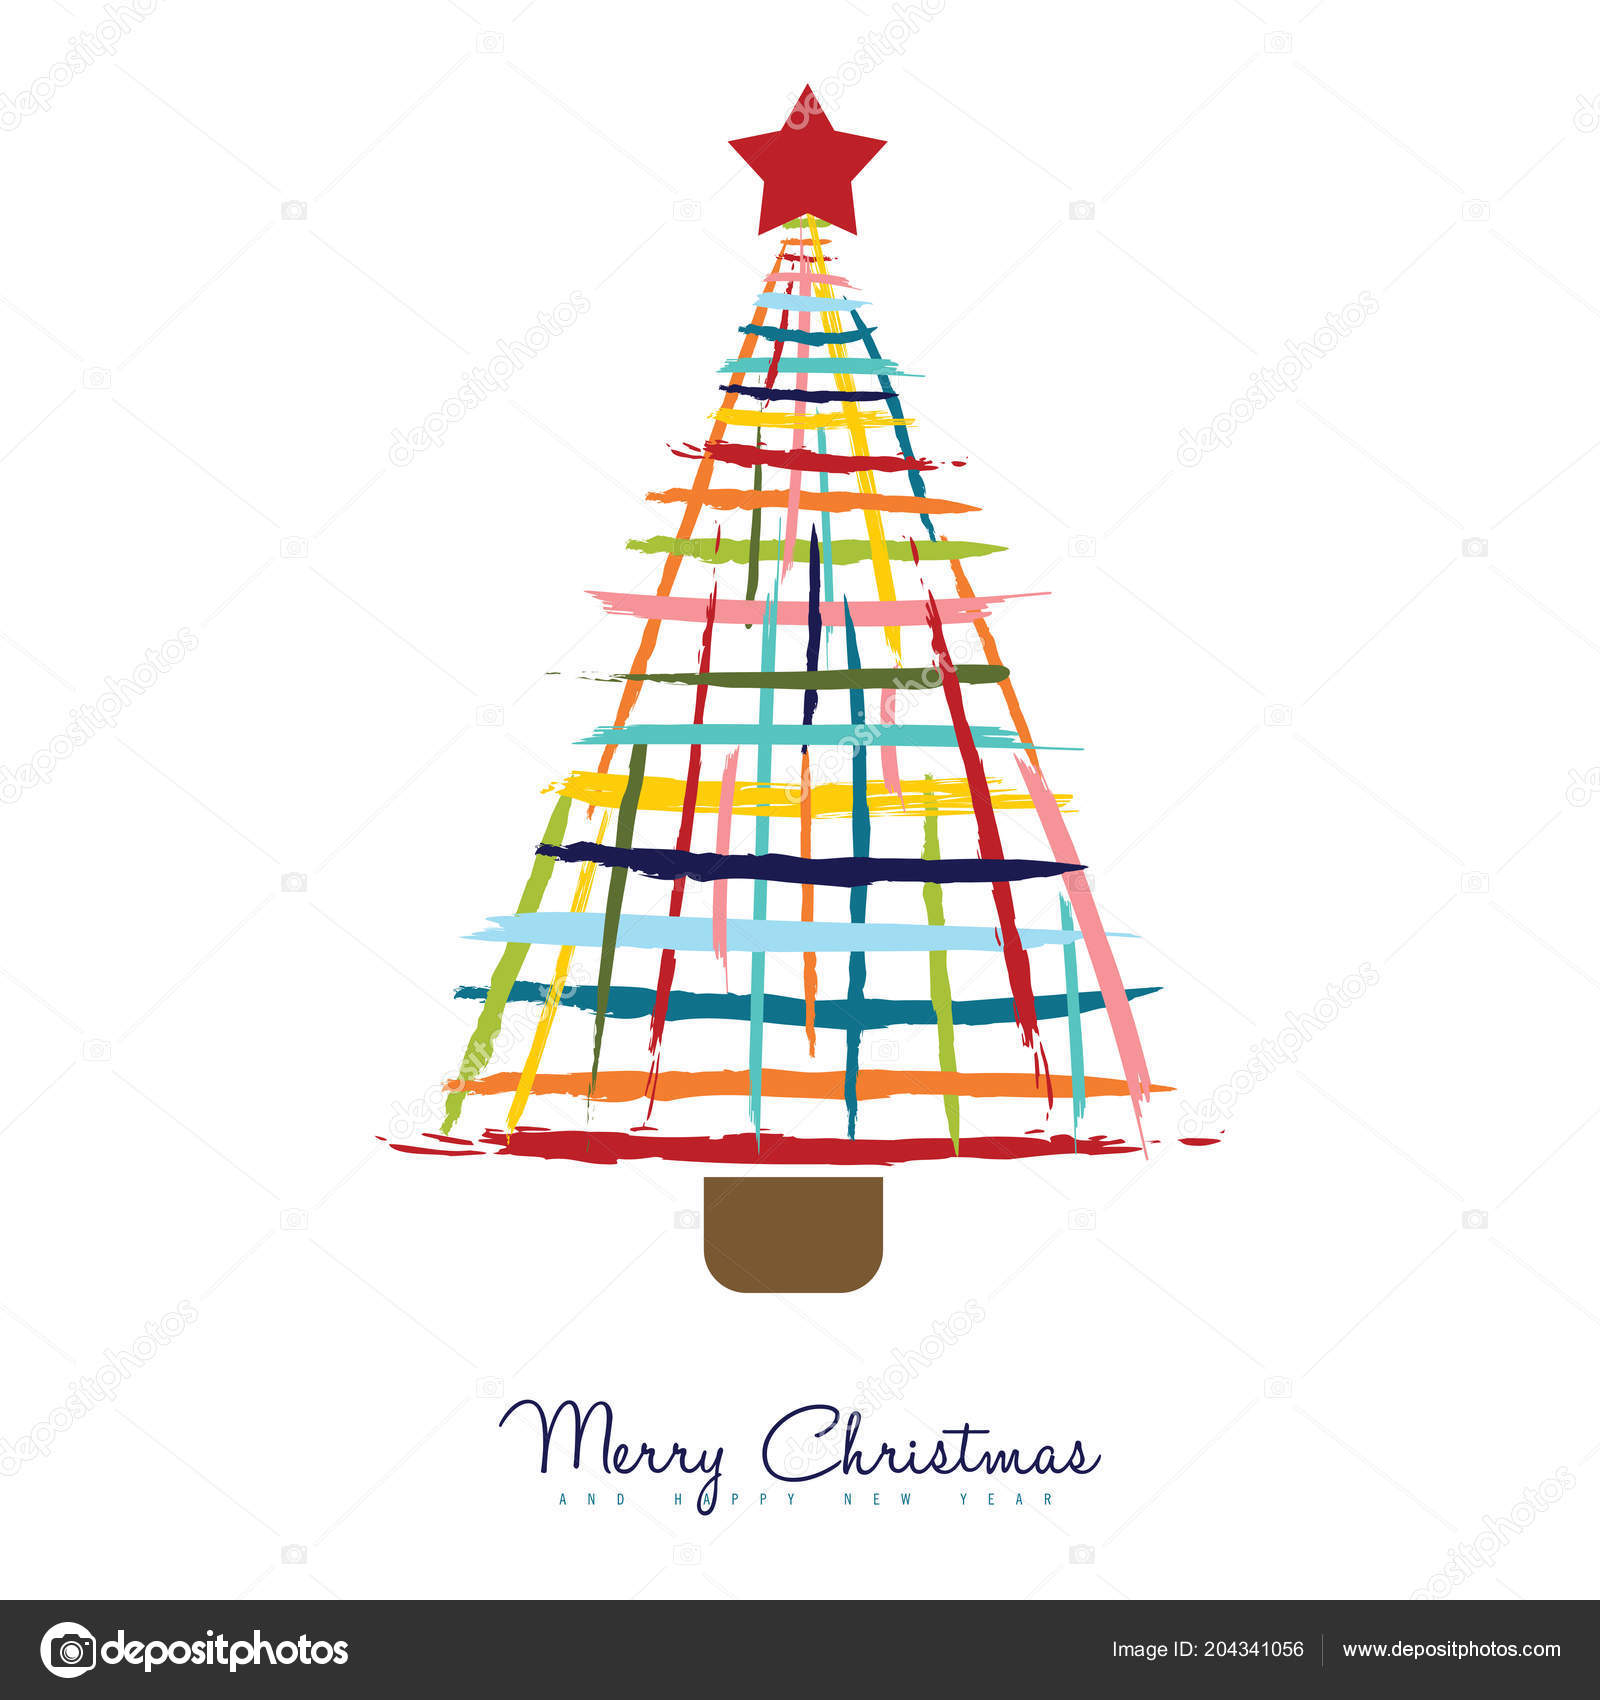 Colorful Merry Christmas Greeting Card Design Fun Color Xmas Pine